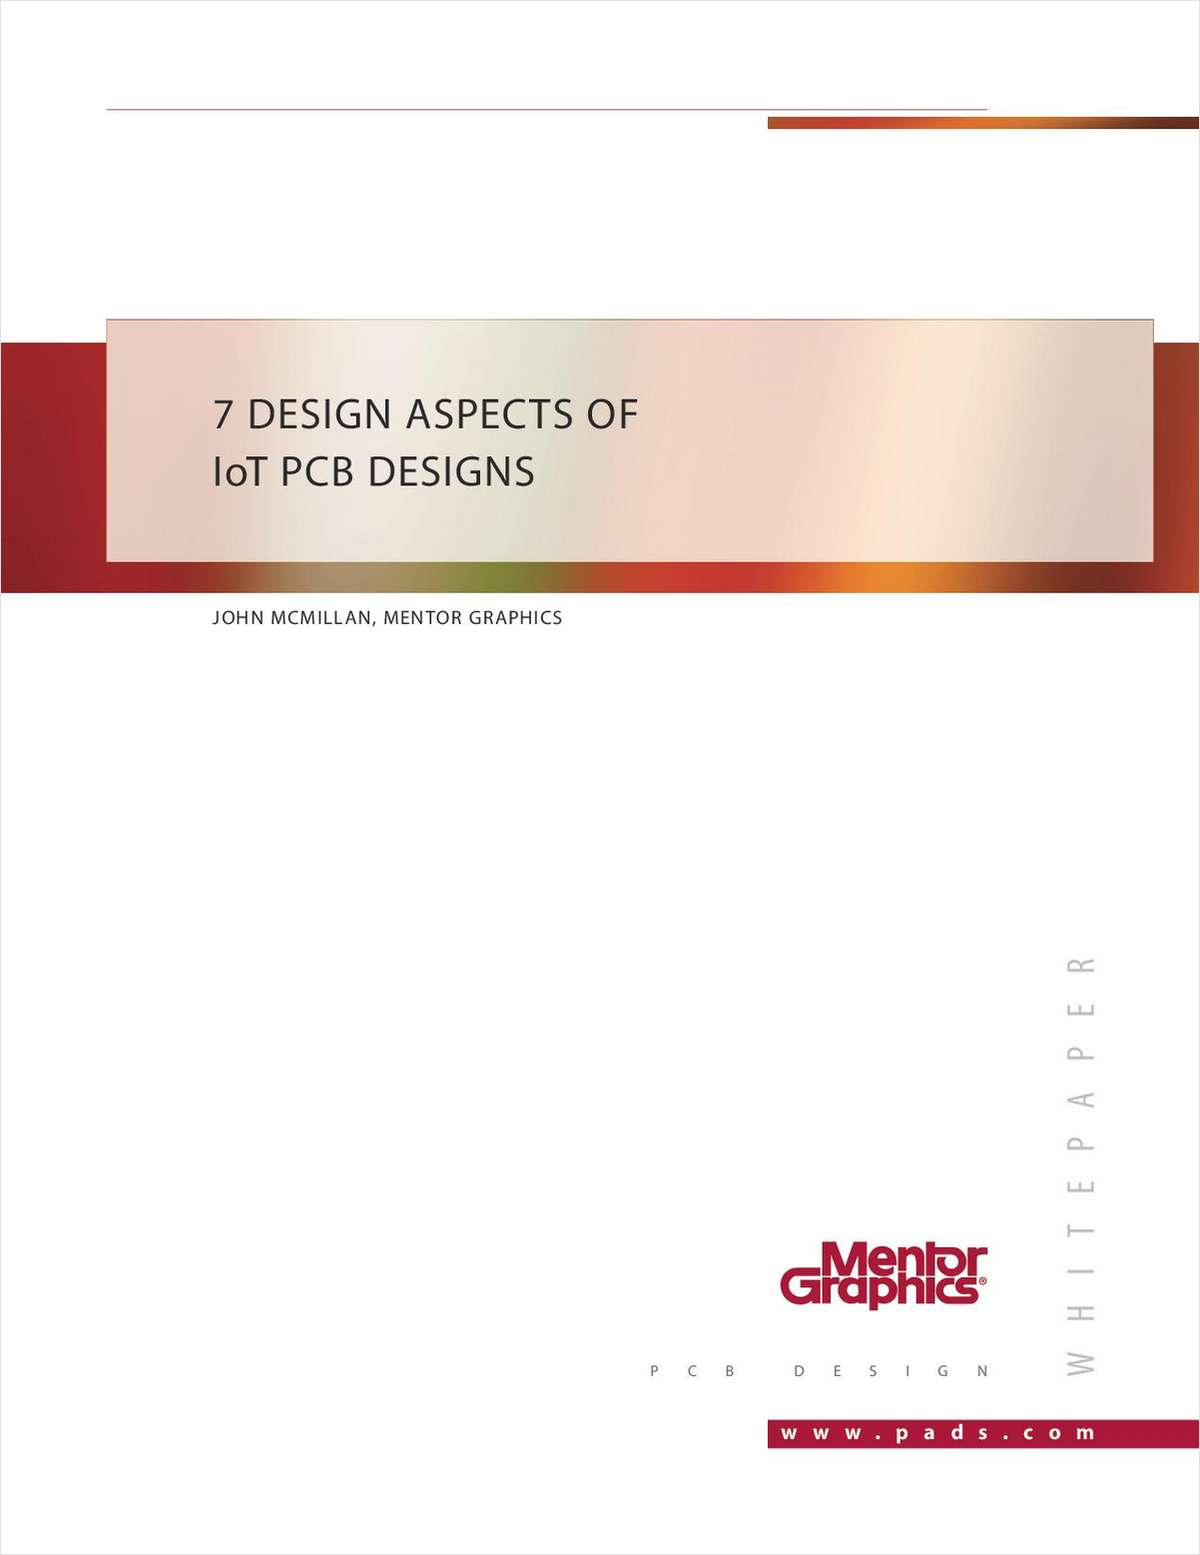 7 Key Design Aspects of IoT PCBs